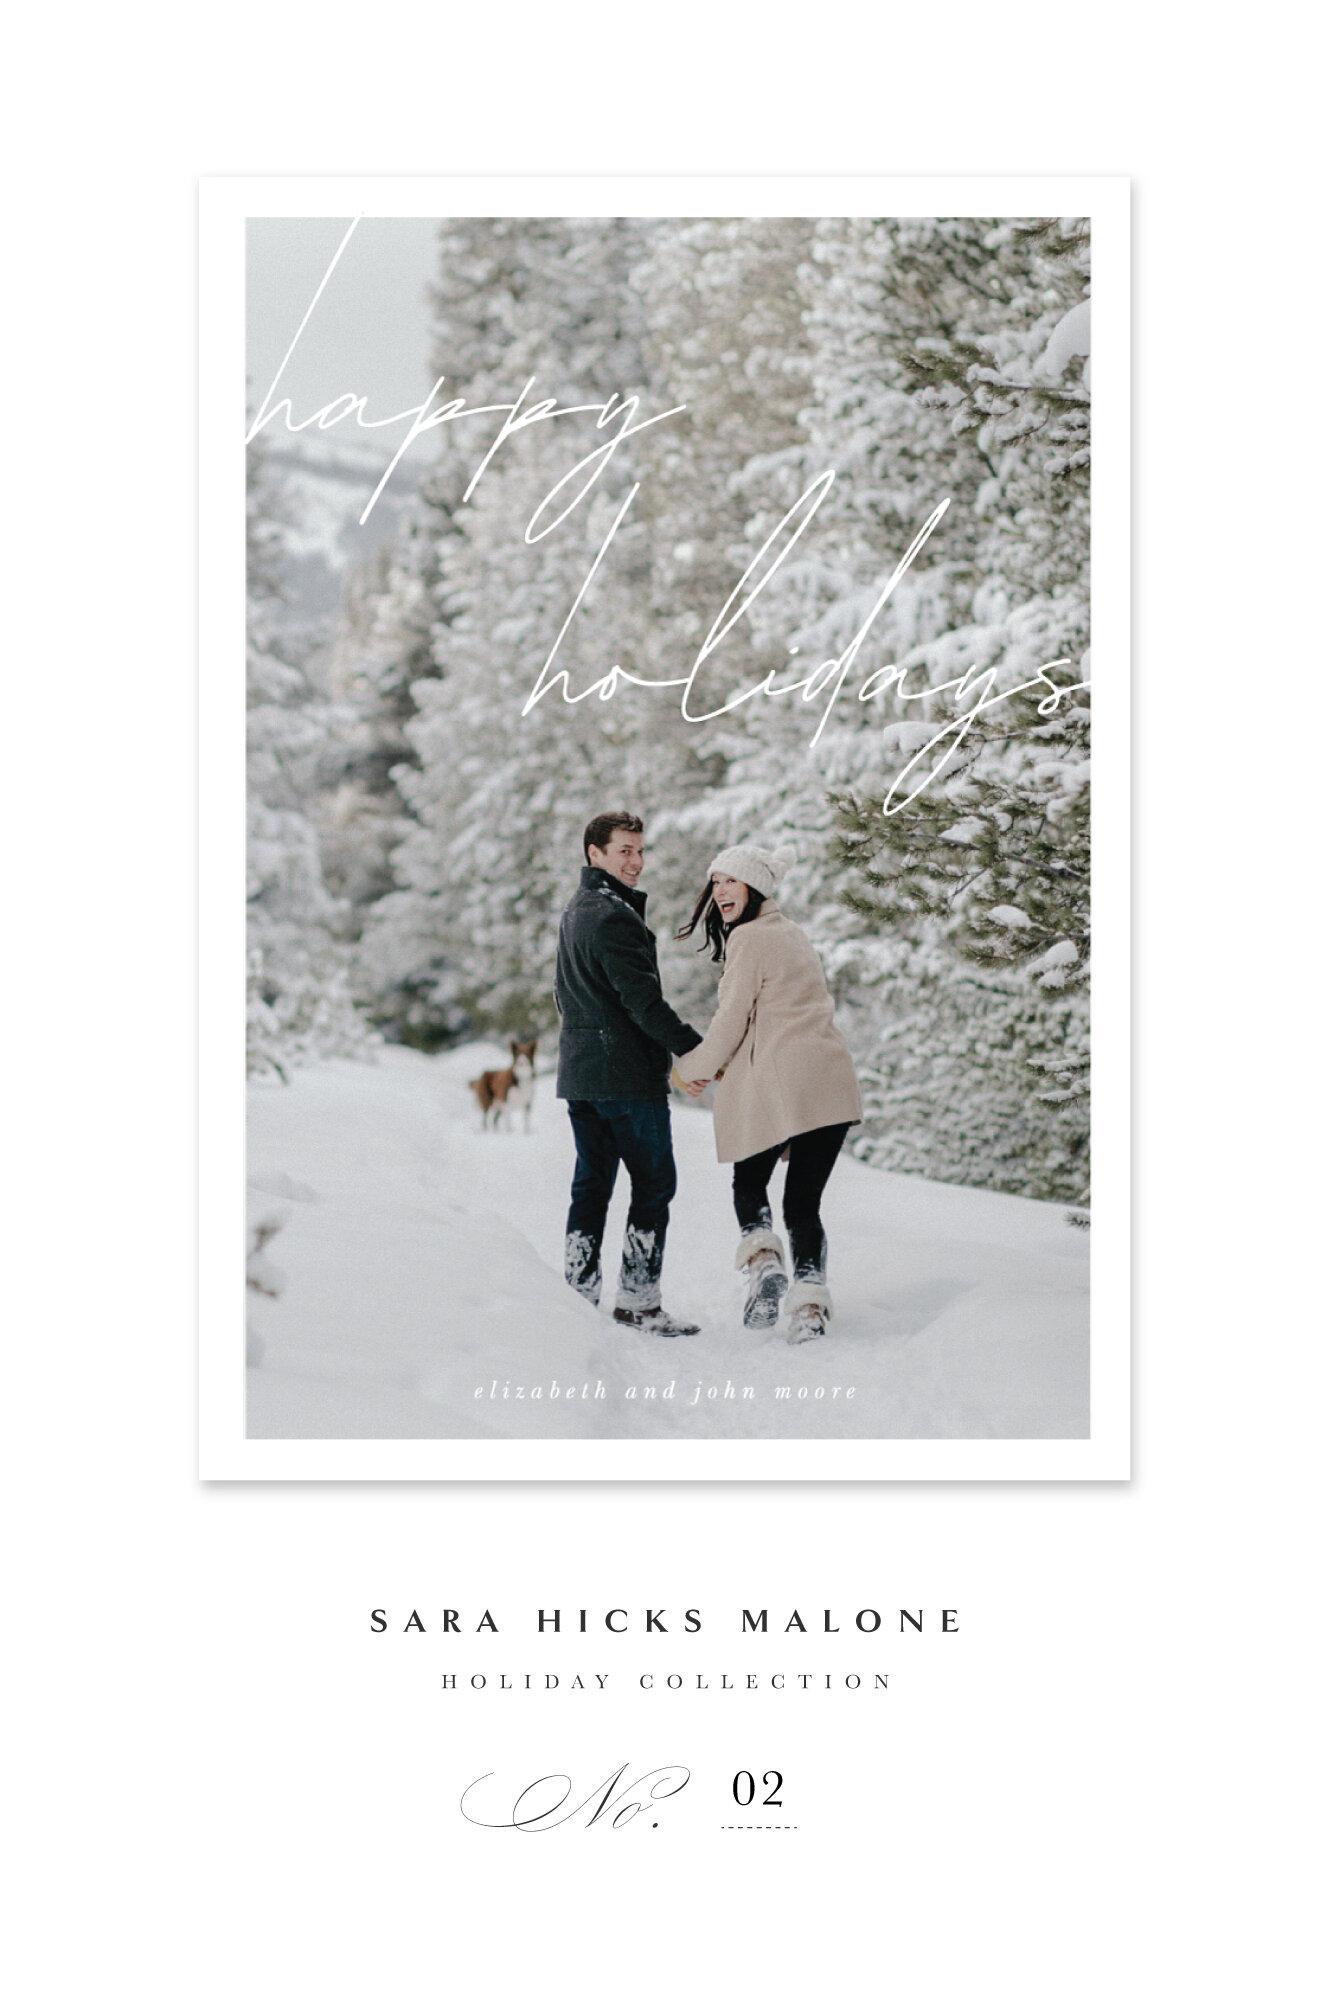 'The Edit' by Sara Hicks Malone